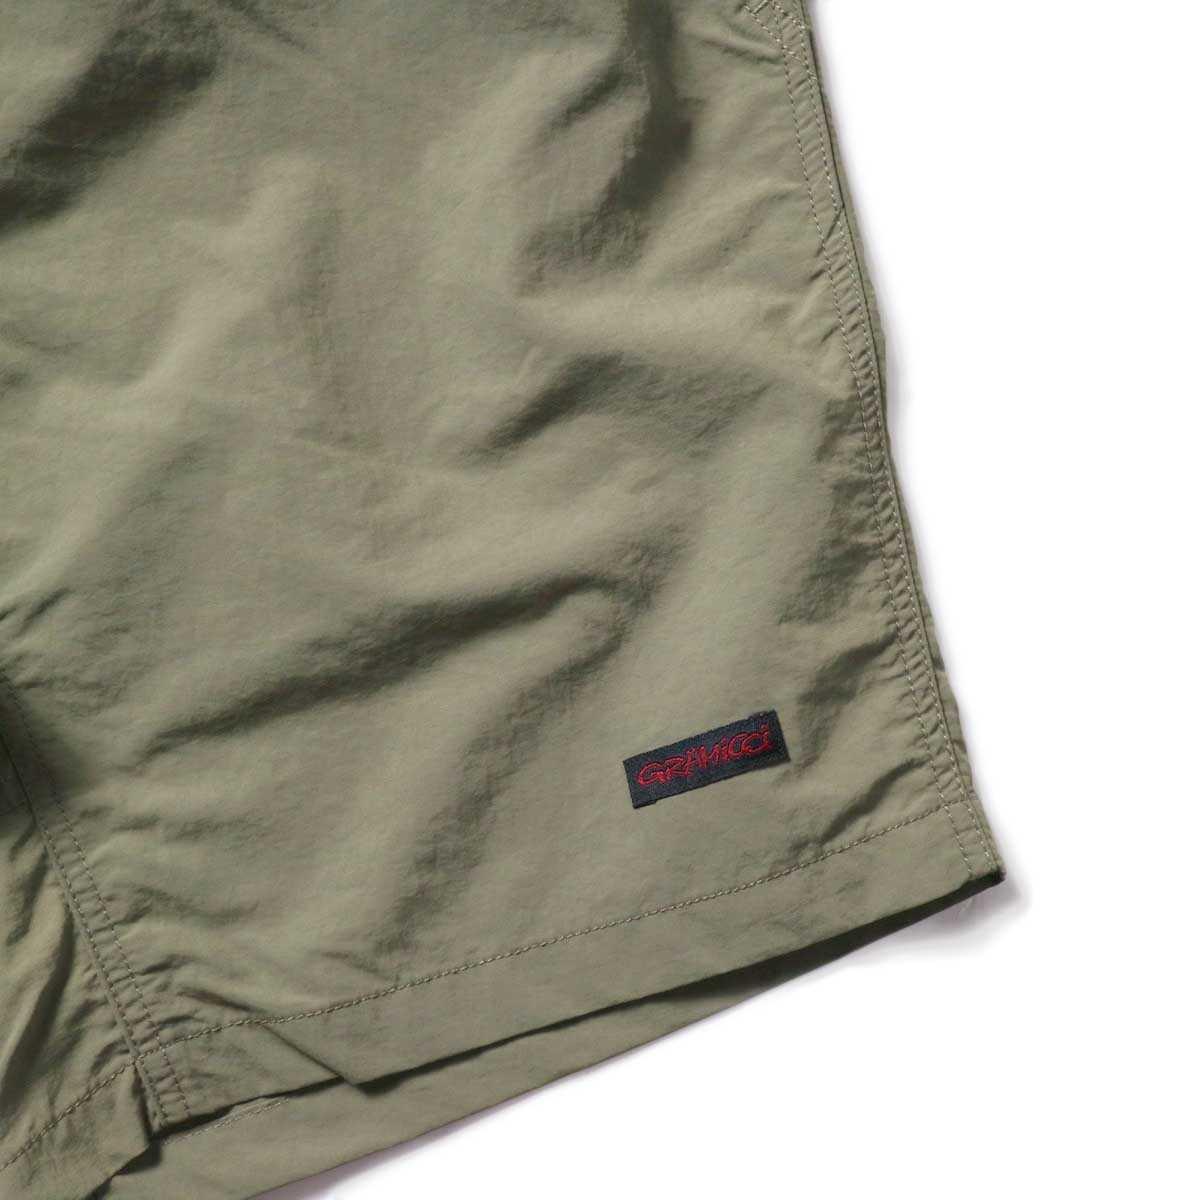 GRAMICCI / SHELL PACKABLE SHORTS (Ash Olive)左裾ビスネーム